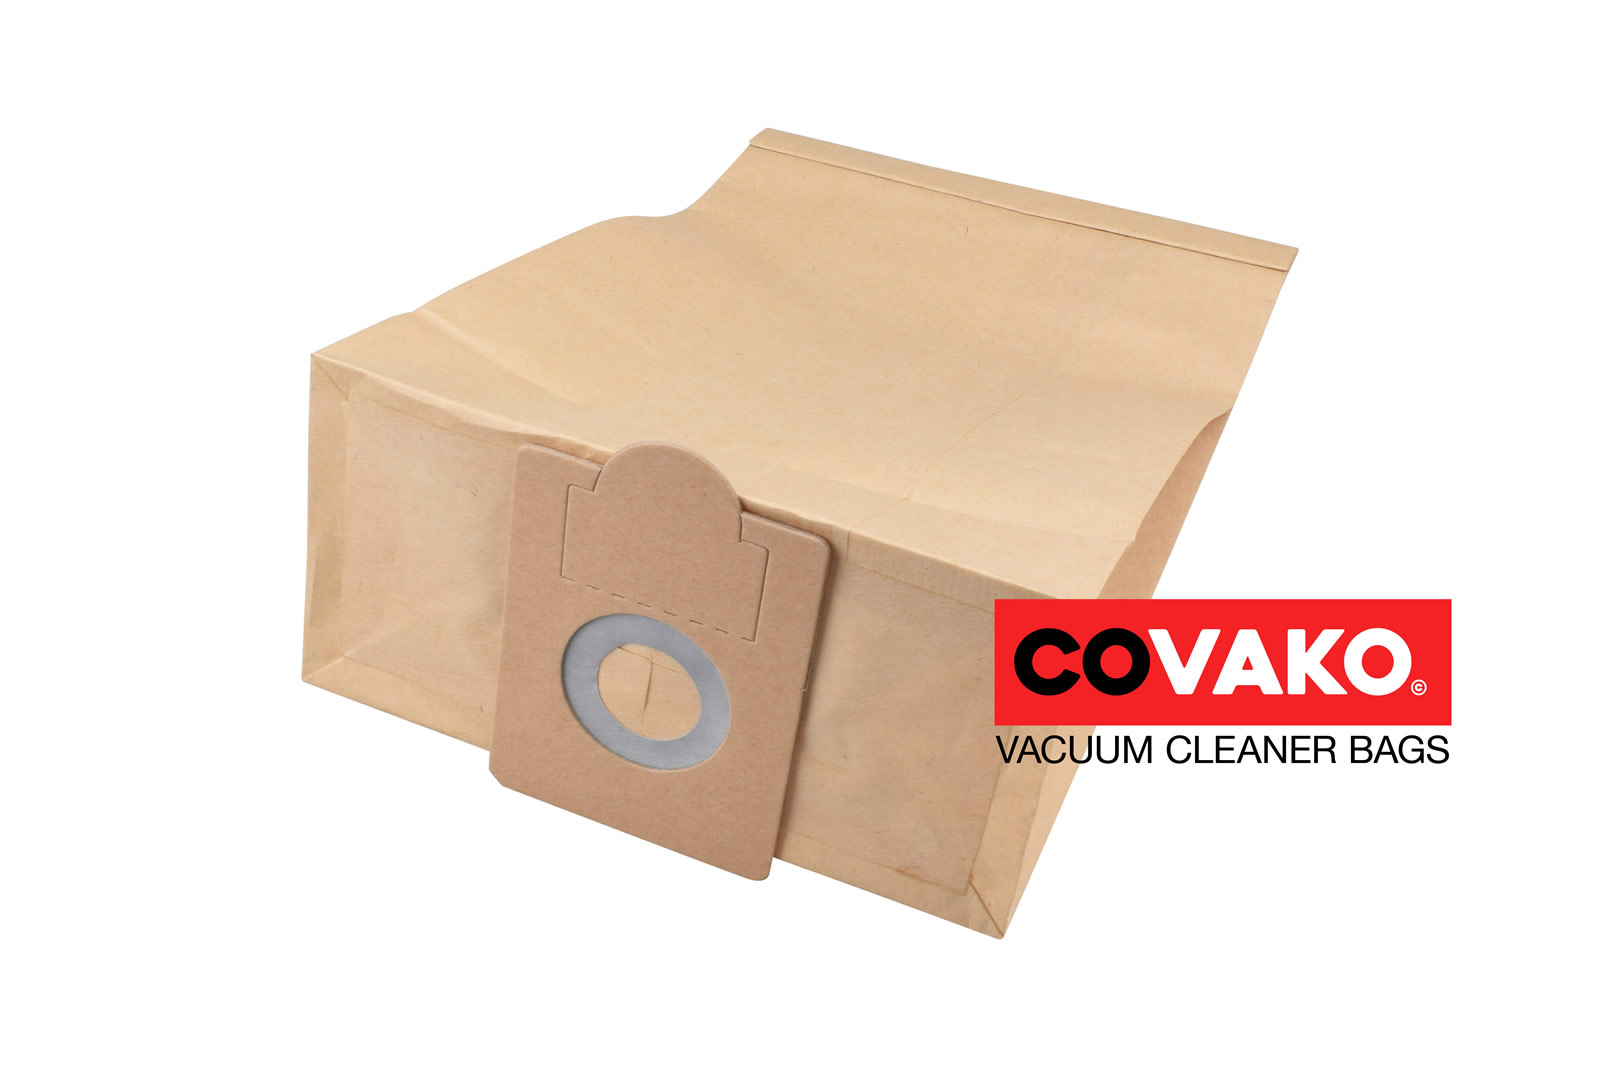 Fakir S 12 / Papier - Fakir stofzuigerzakken